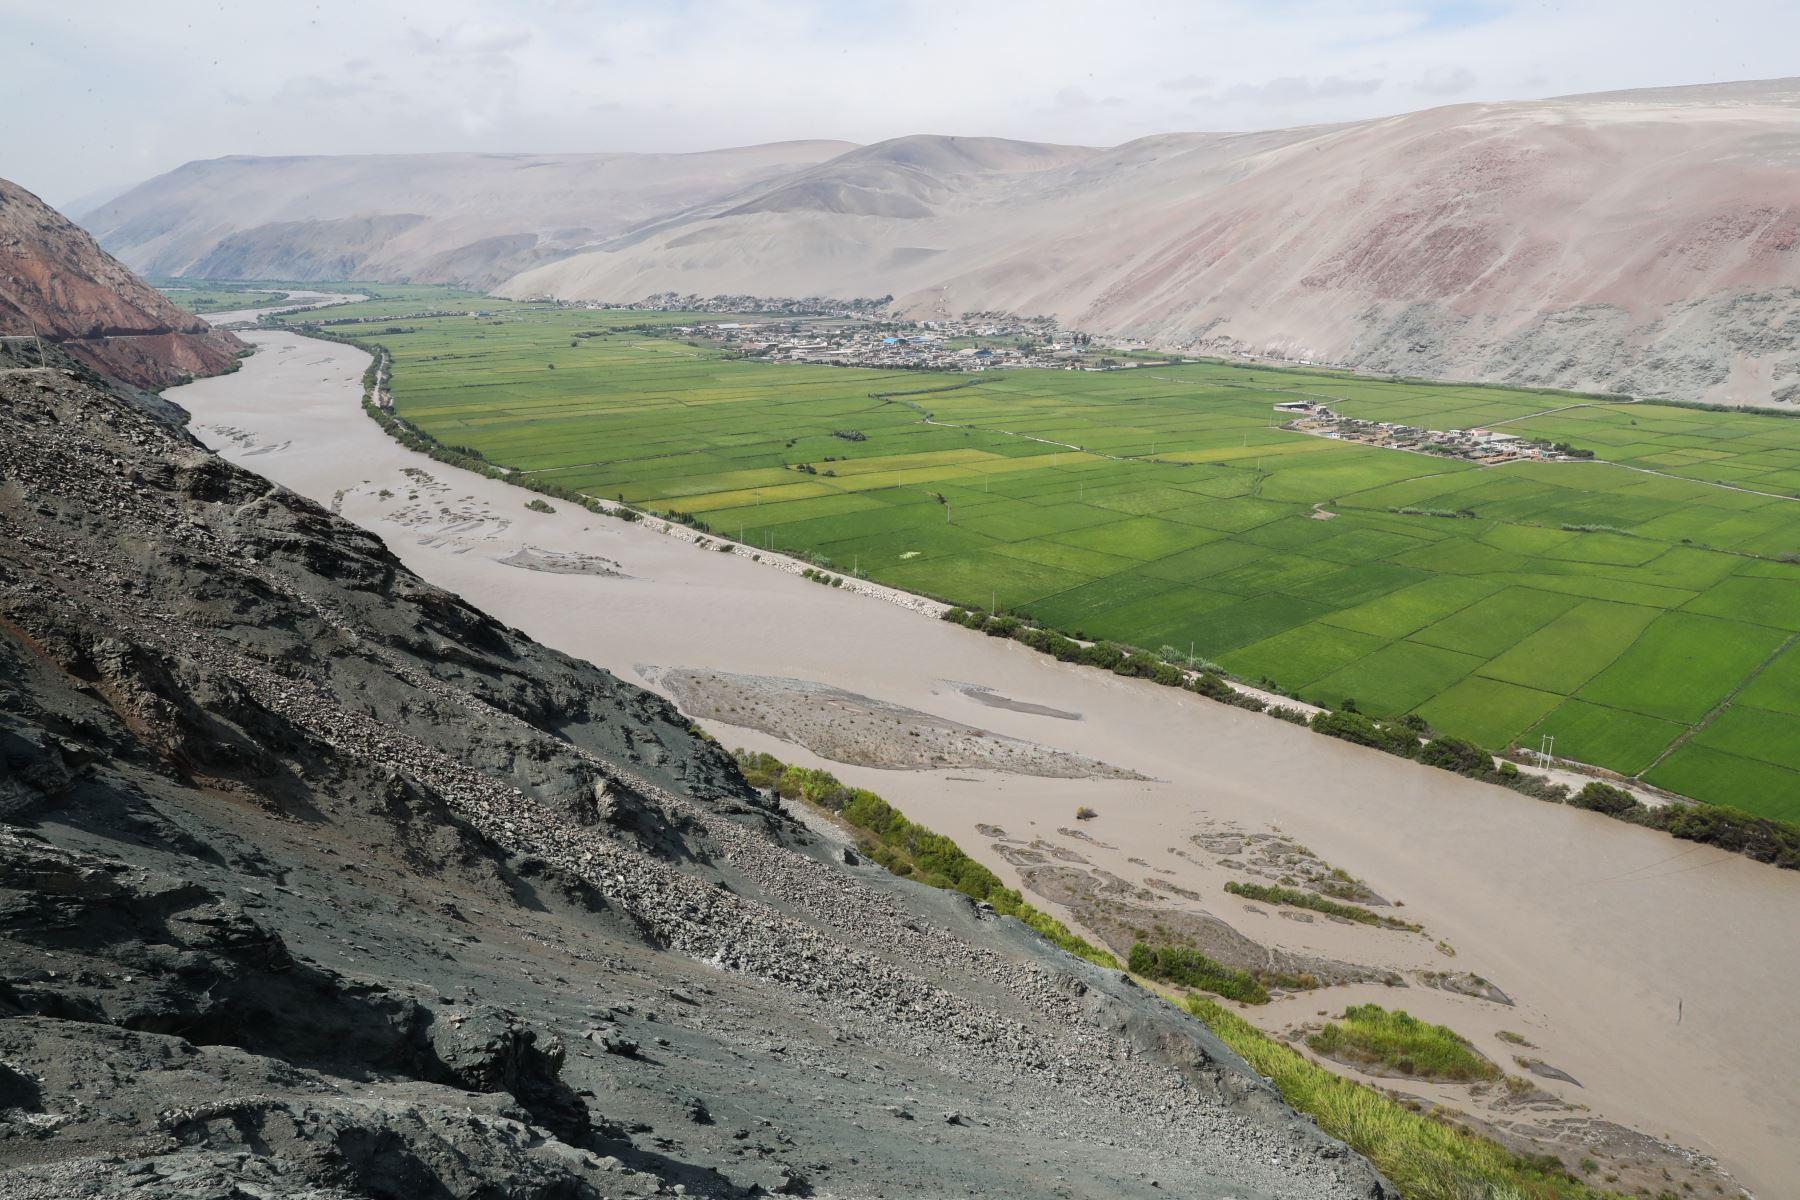 Desembocadura del Río Ocoña, Arequipa.  Foto: ANDINA/Juan Carlos Guzmán Negrini